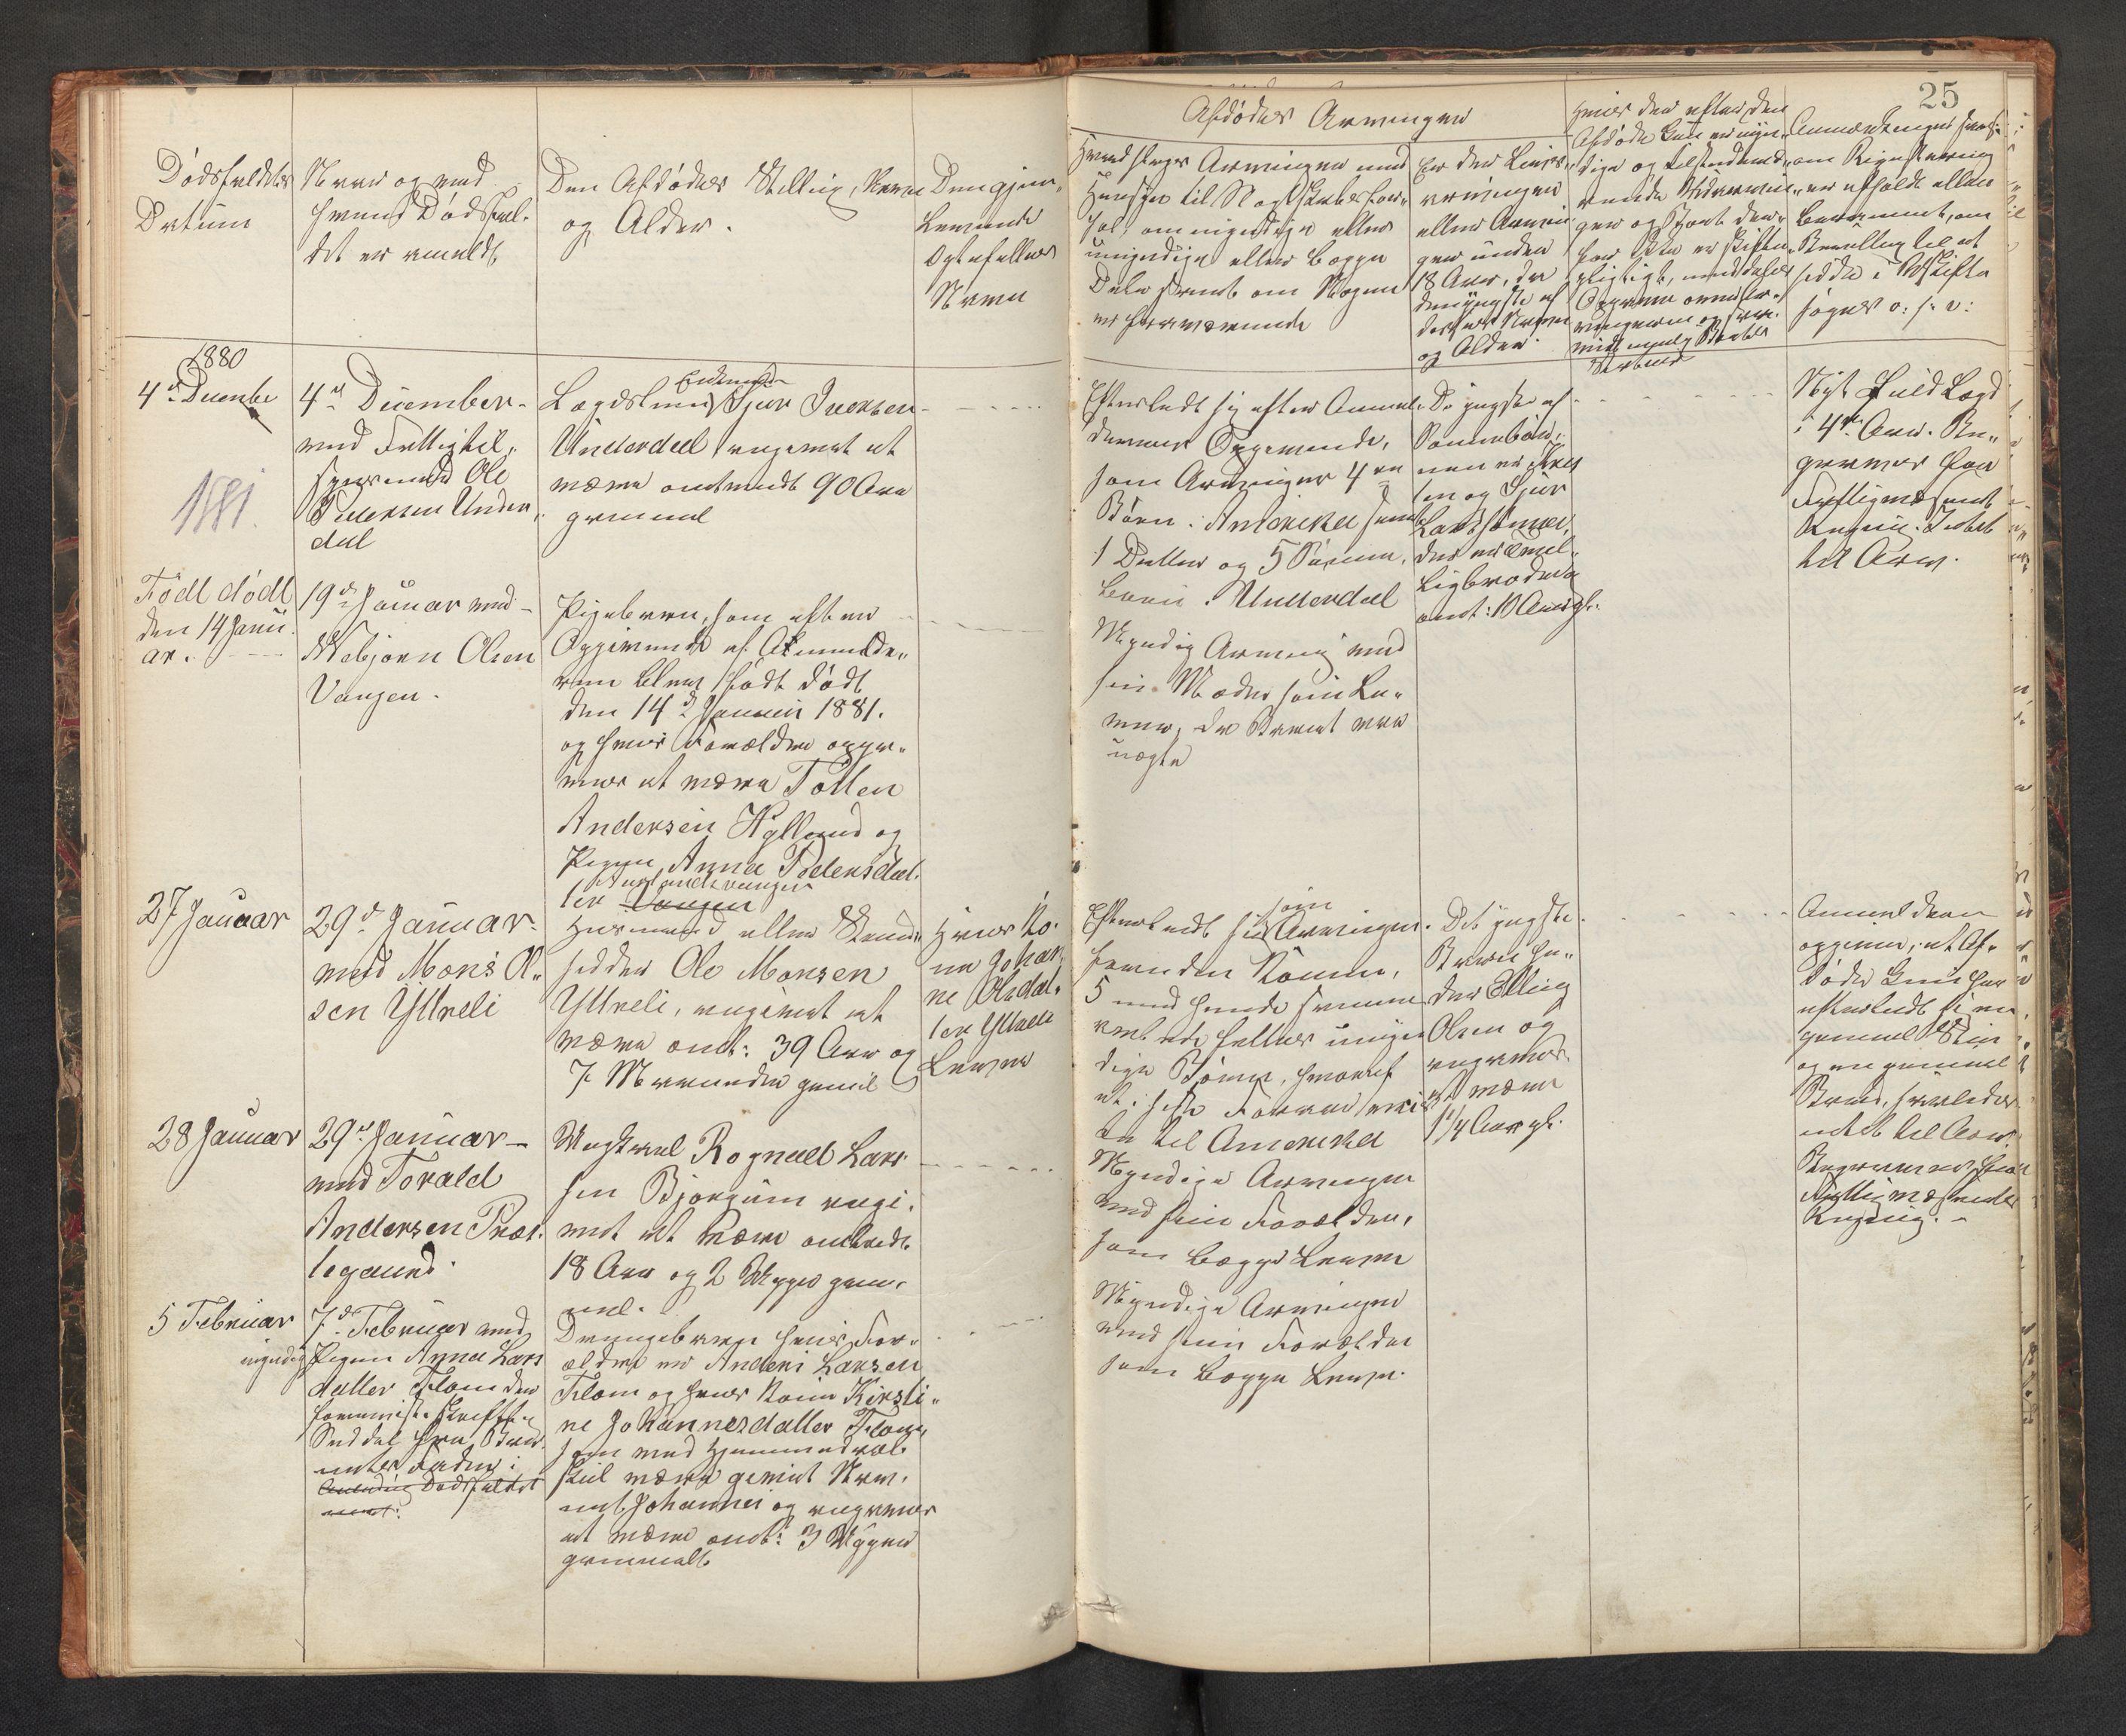 SAB, Lensmannen i Aurland, 0006/L0002: Dødsfallprotokoll, 1877-1892, s. 24b-25a